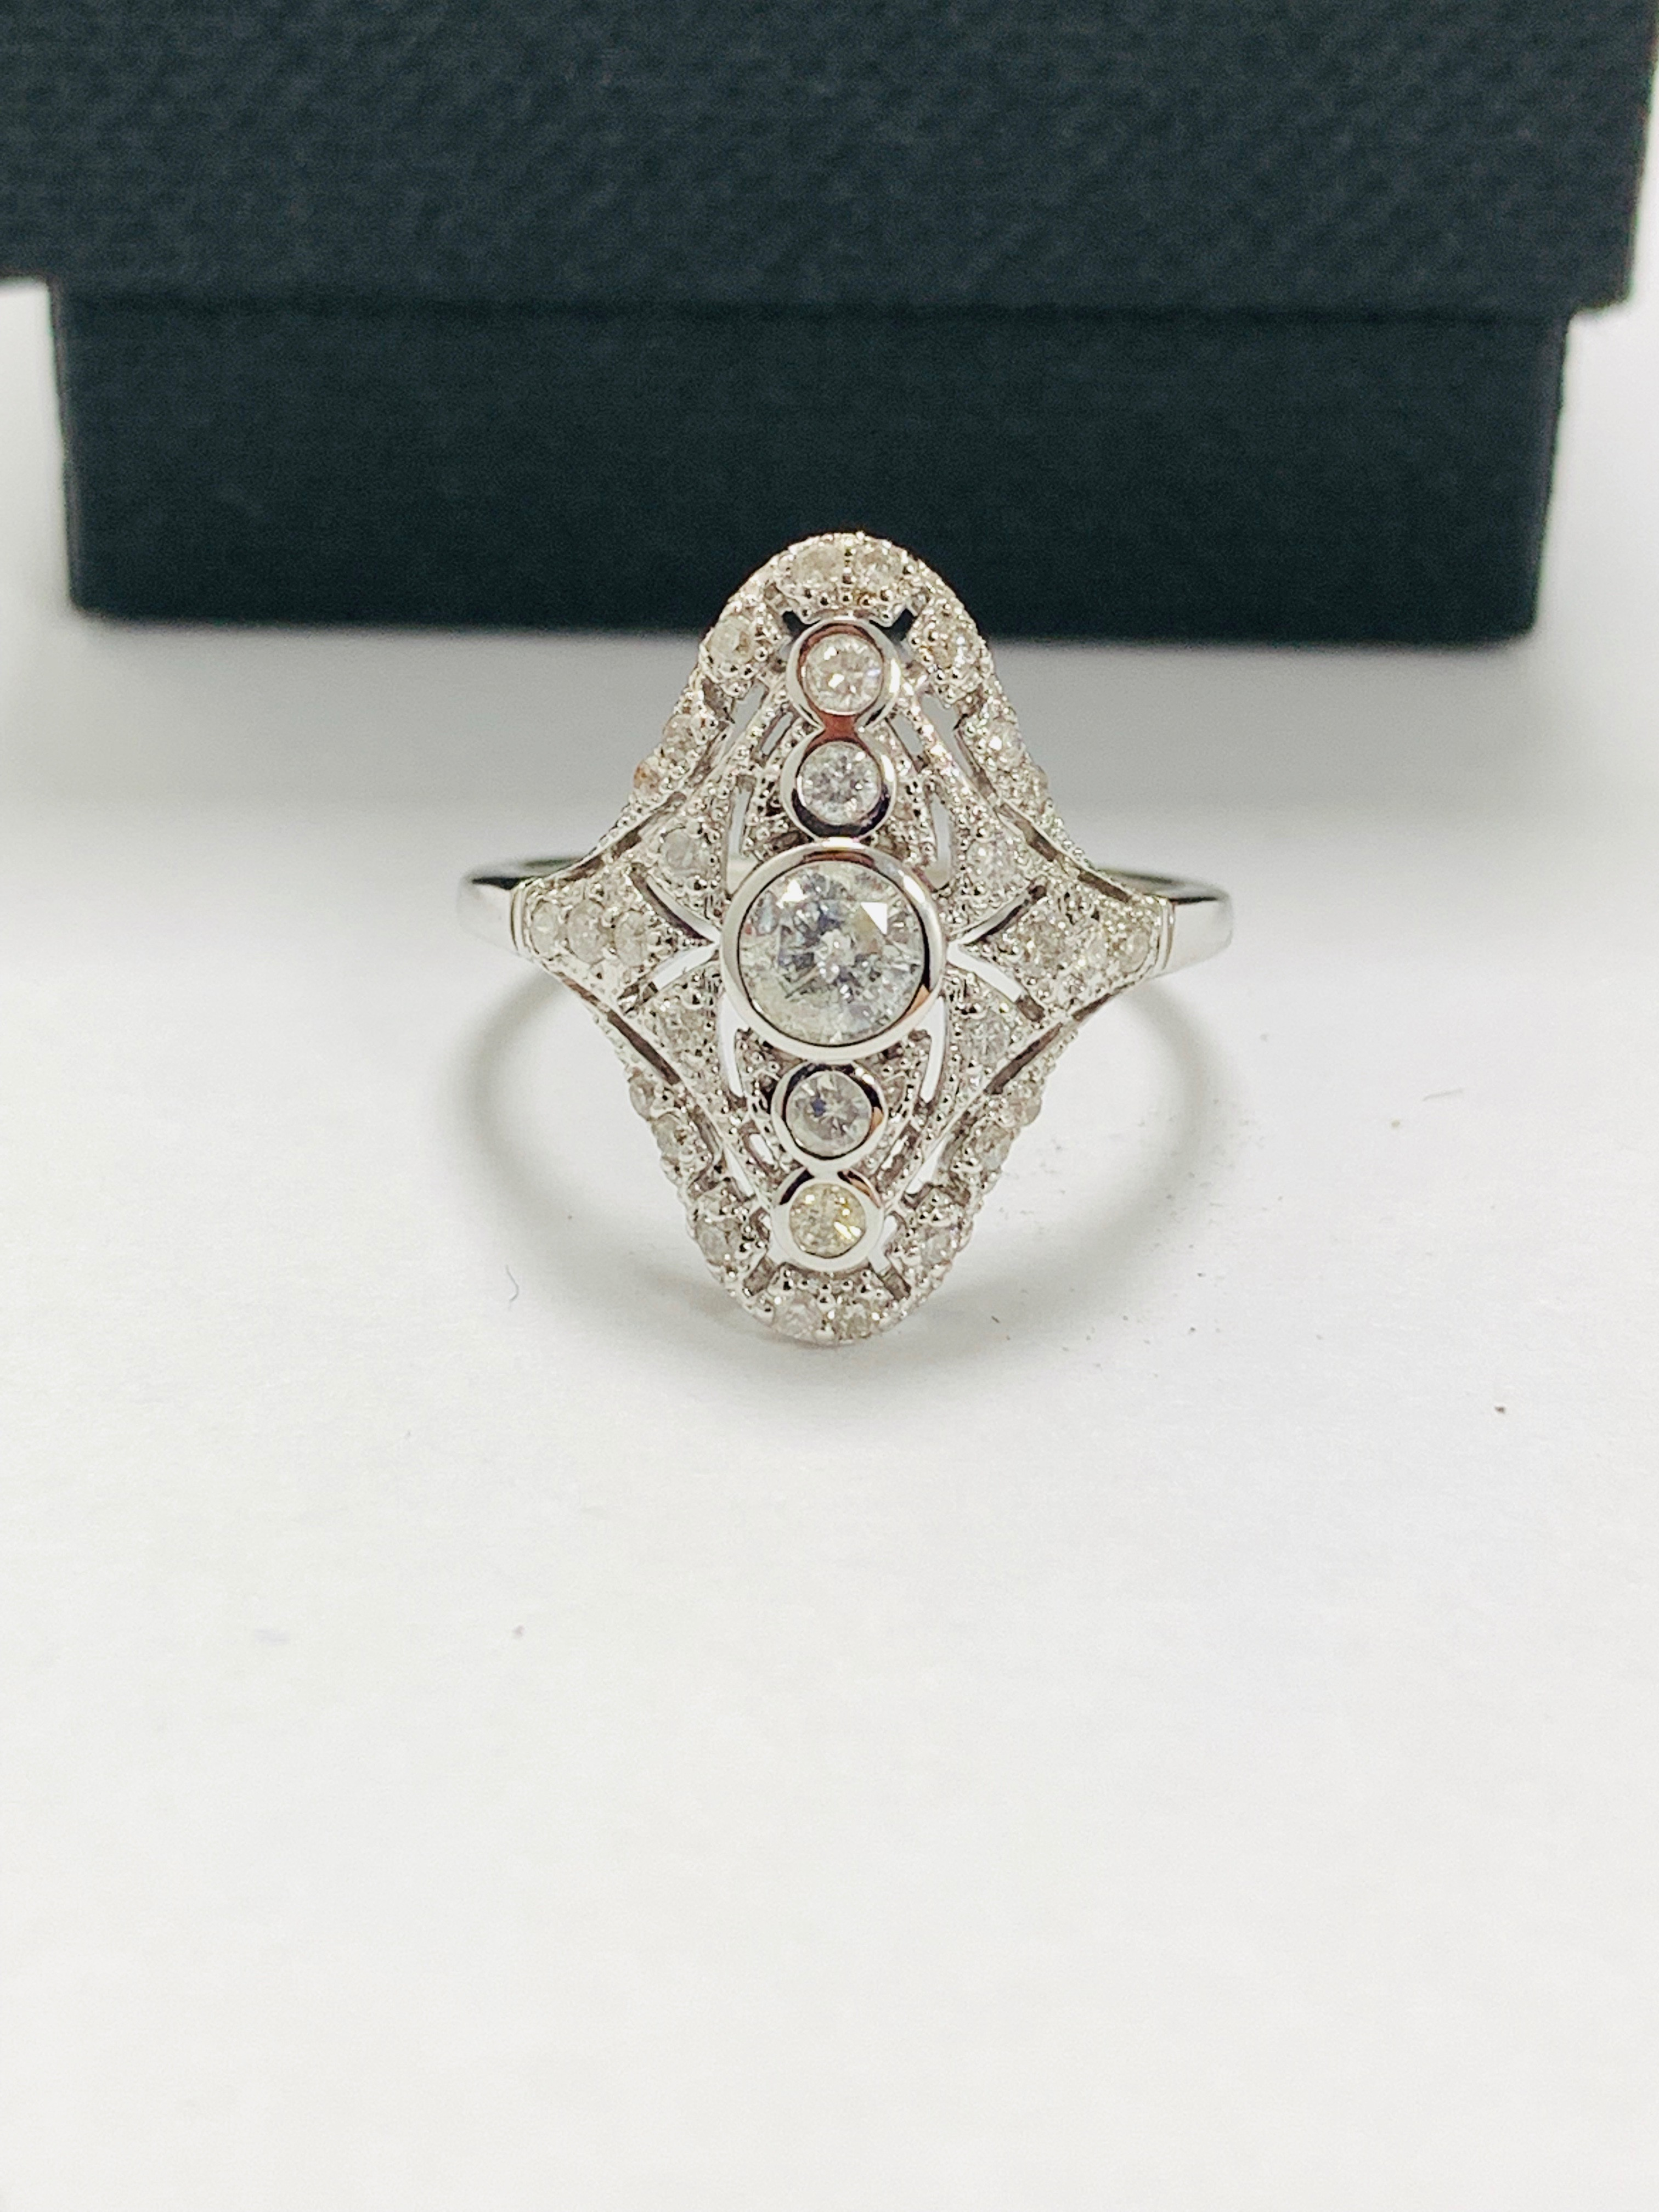 18ct white gold diamond ring.